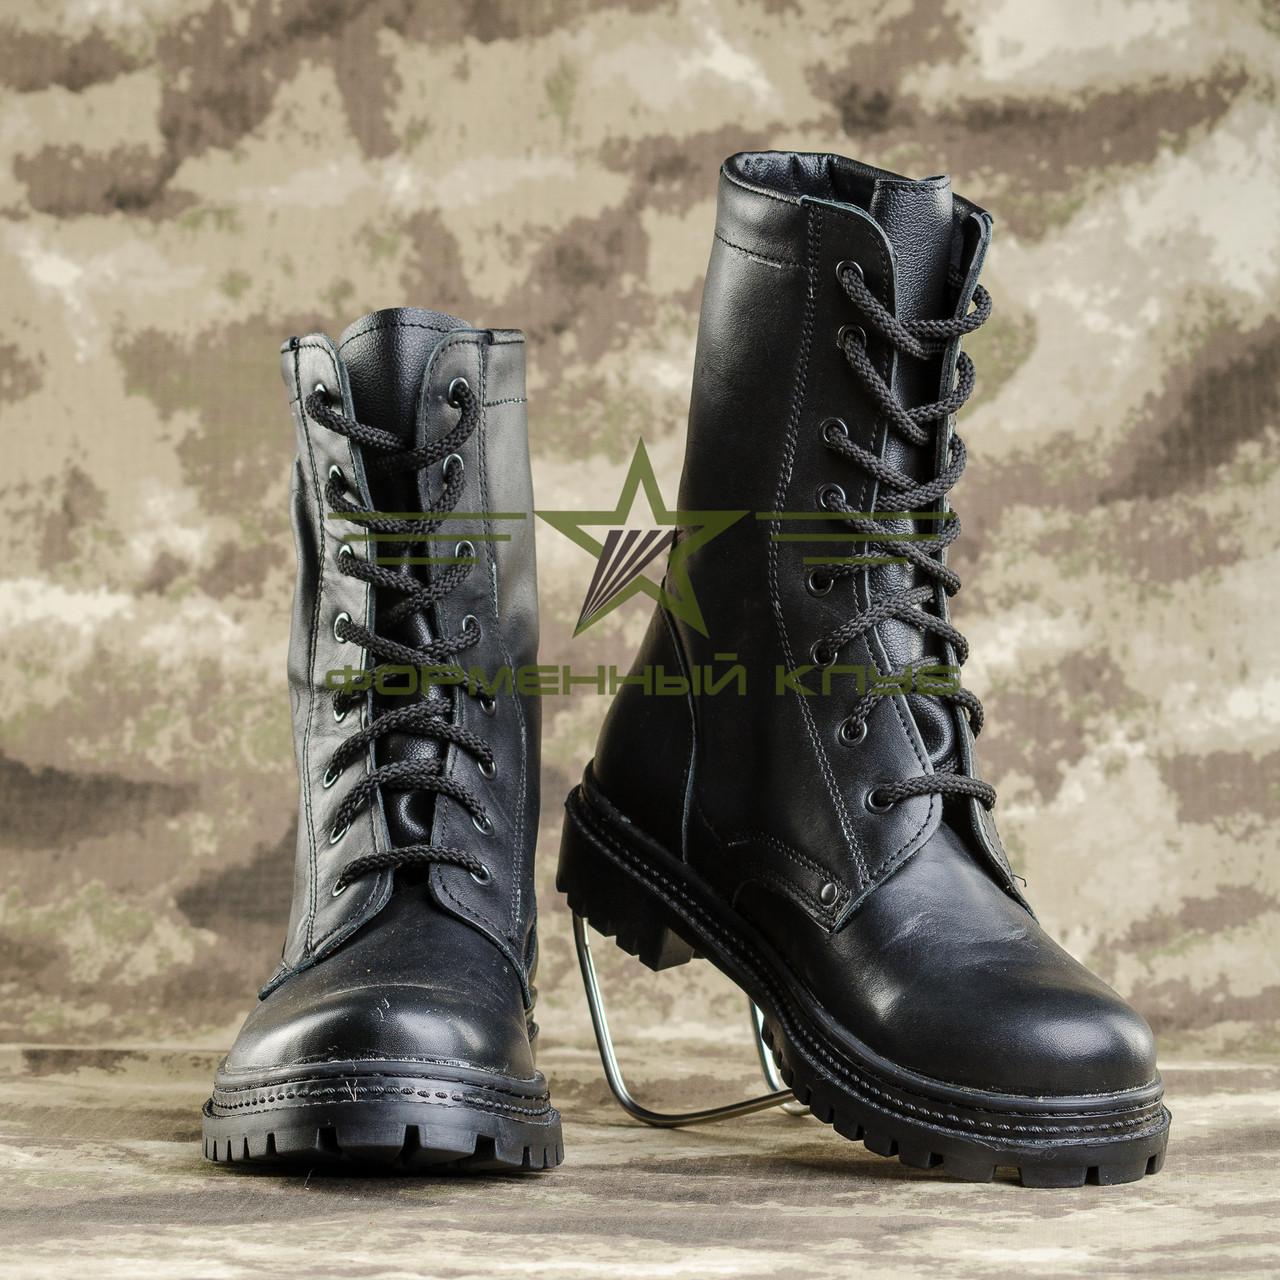 Берцы НАТО натуральная кожа черные